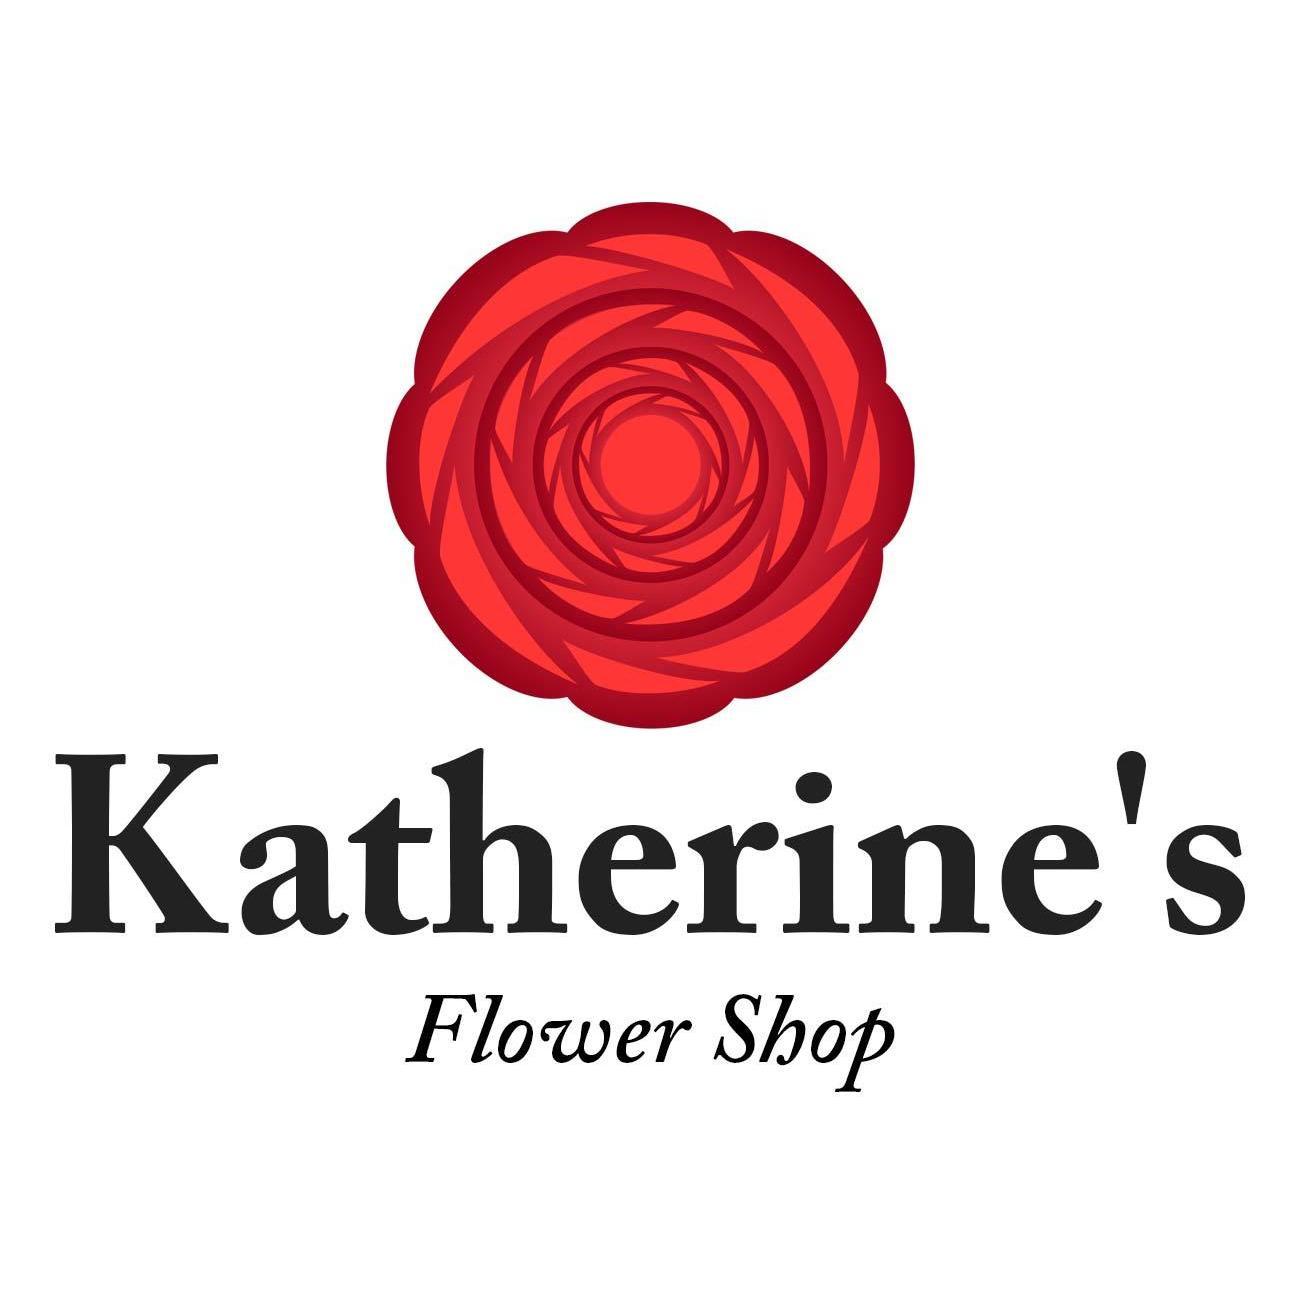 Katherine's Flower Shop